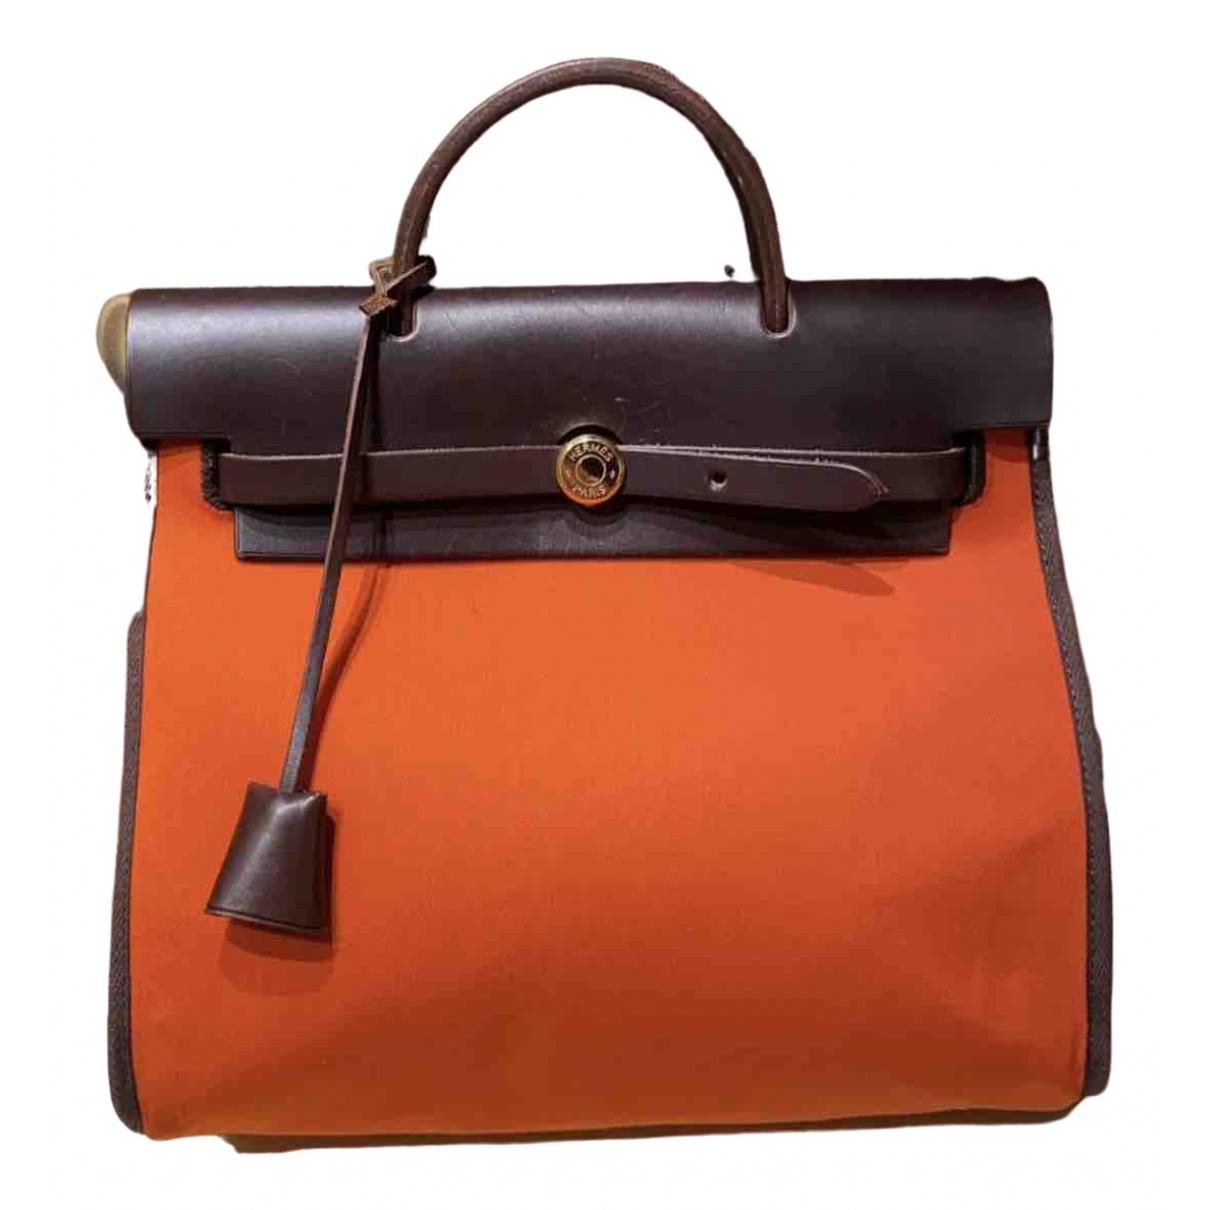 Hermes - Sac a main Herbag pour femme en toile - orange